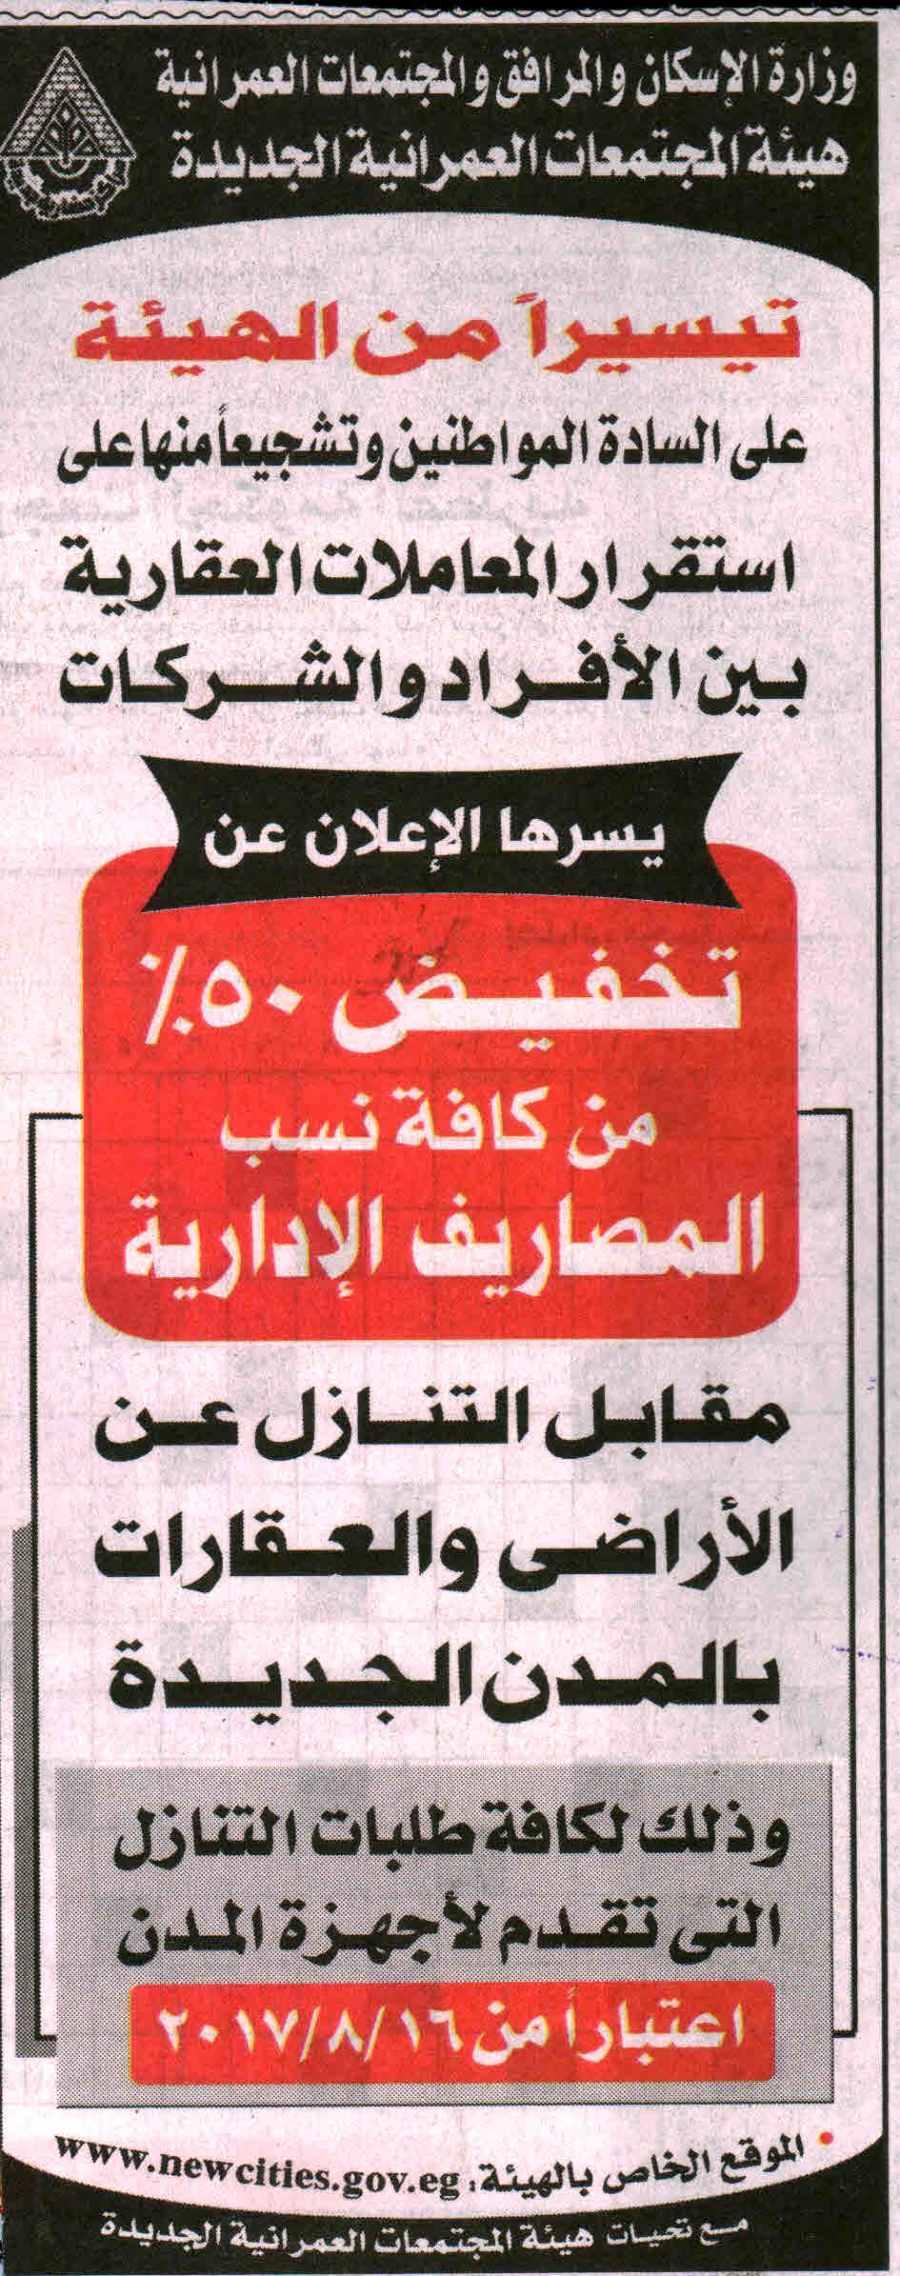 Al Akhbar 7 Sep P.1.jpg